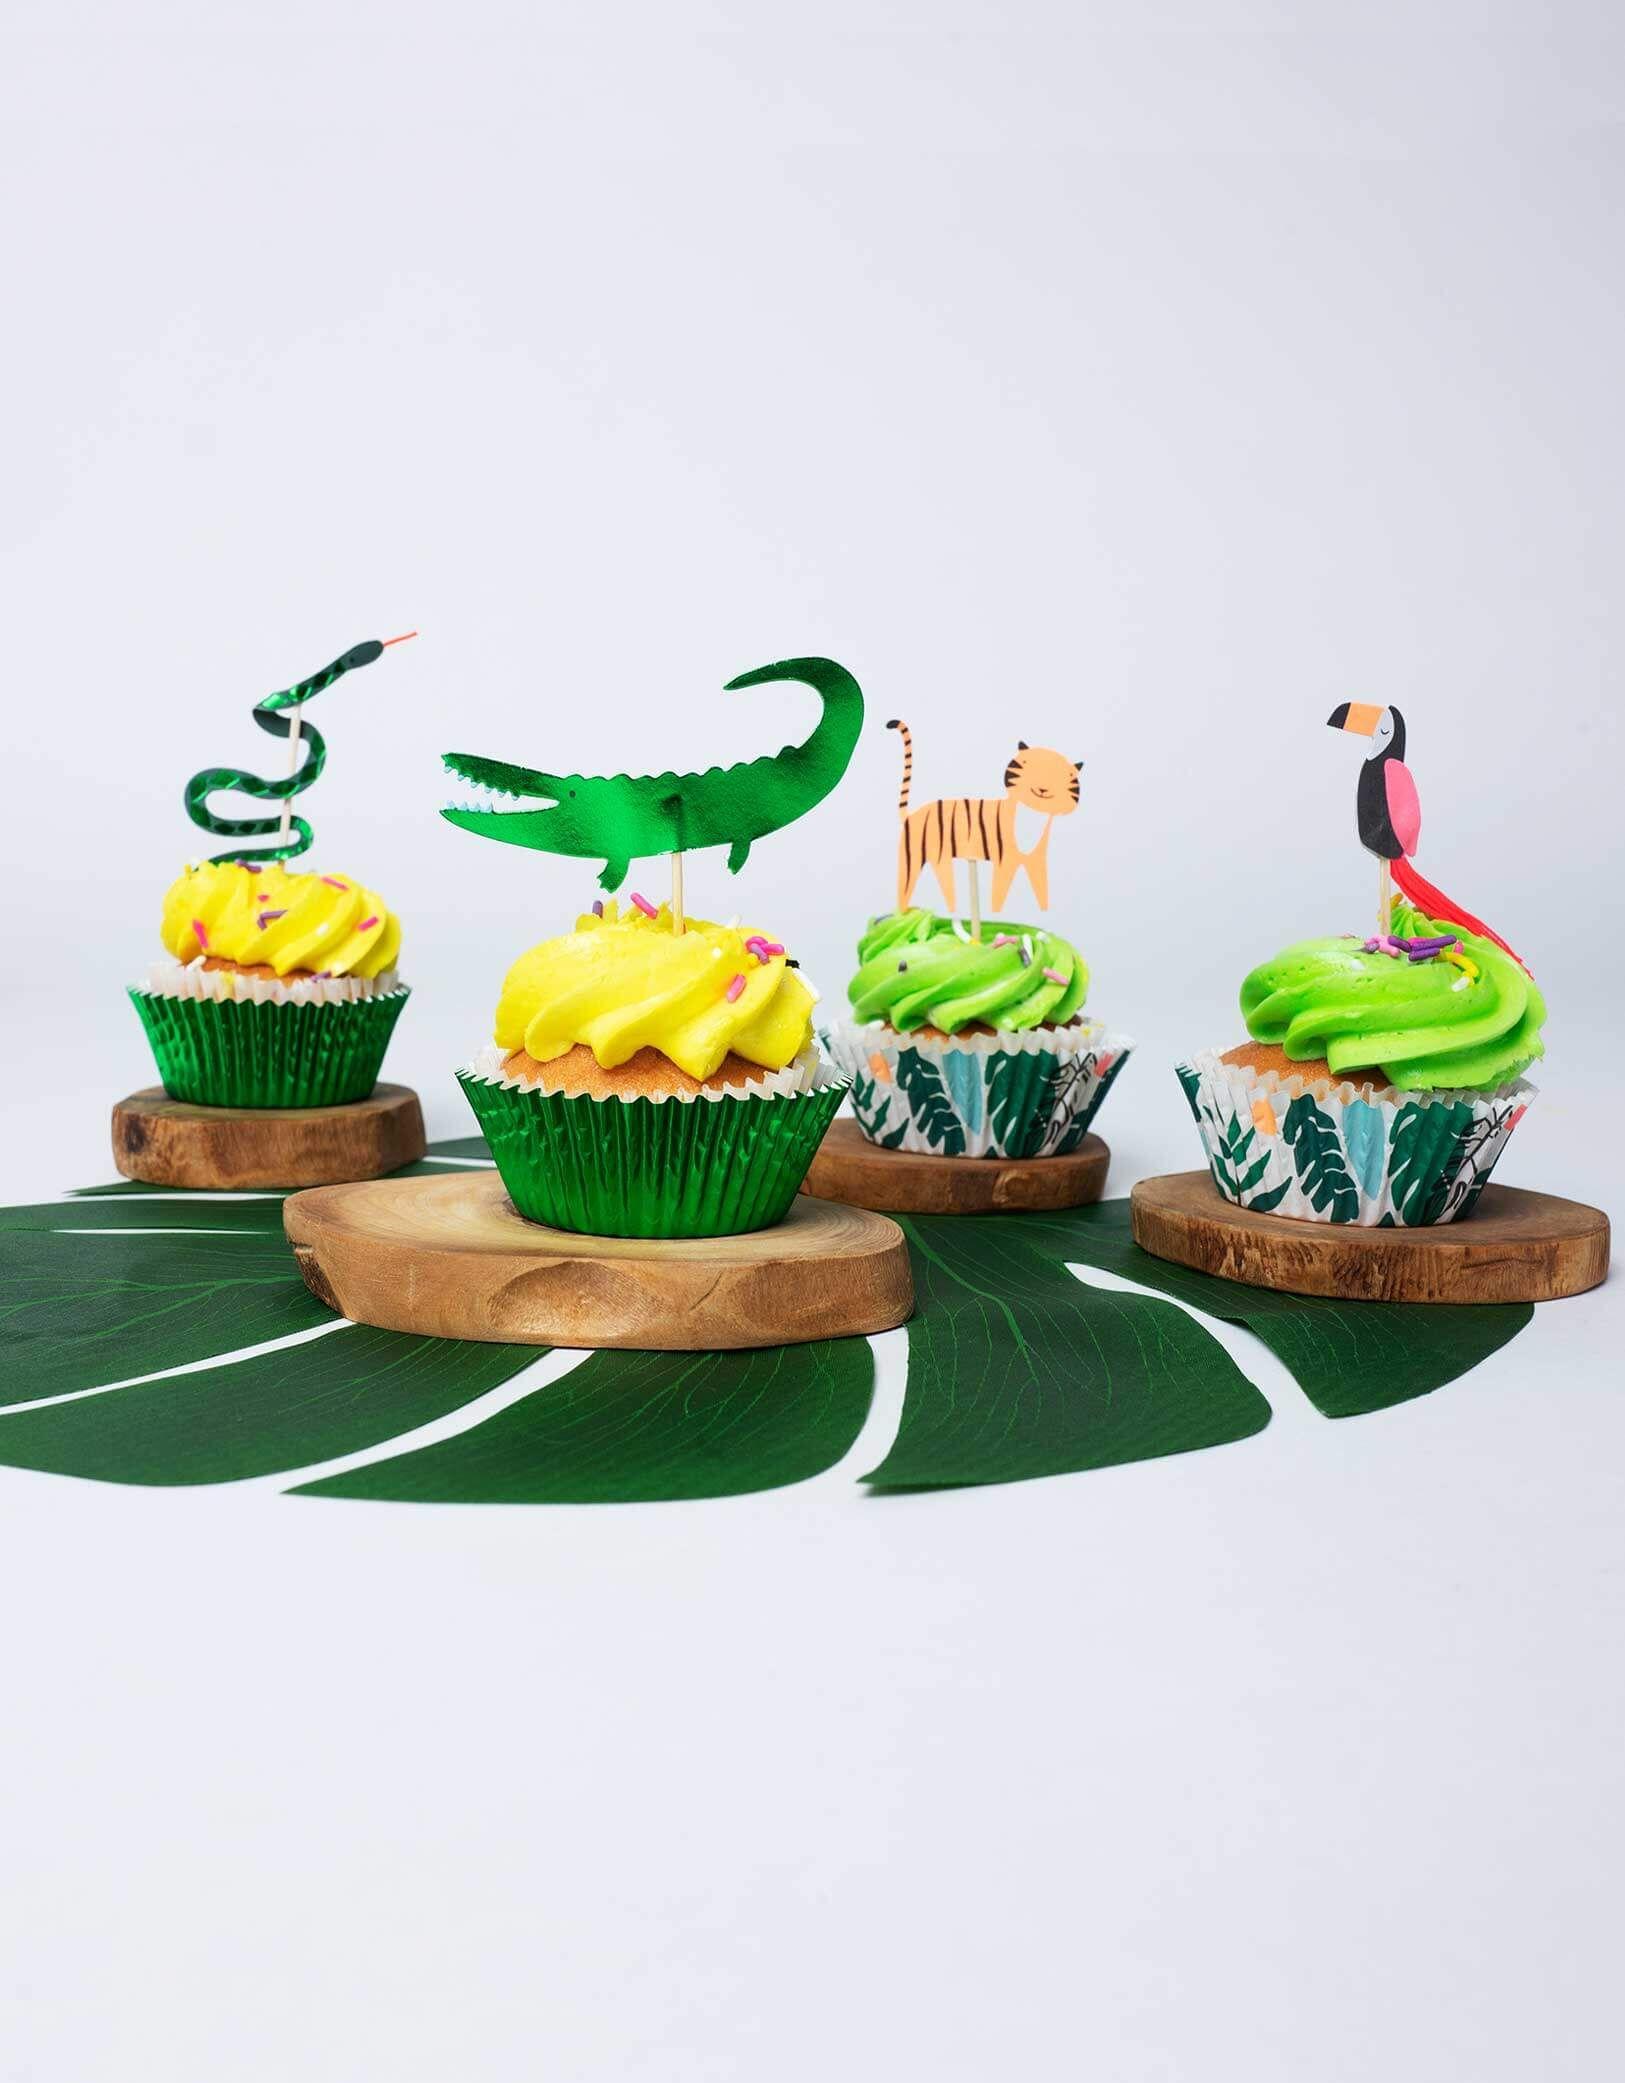 Go Wild Jungle Cupcake Decorating Kit  Tiger  Crocodile  Snake Toucan  Cake toppers  Cupcake Cases  Birthday Boy  Cake Decoration